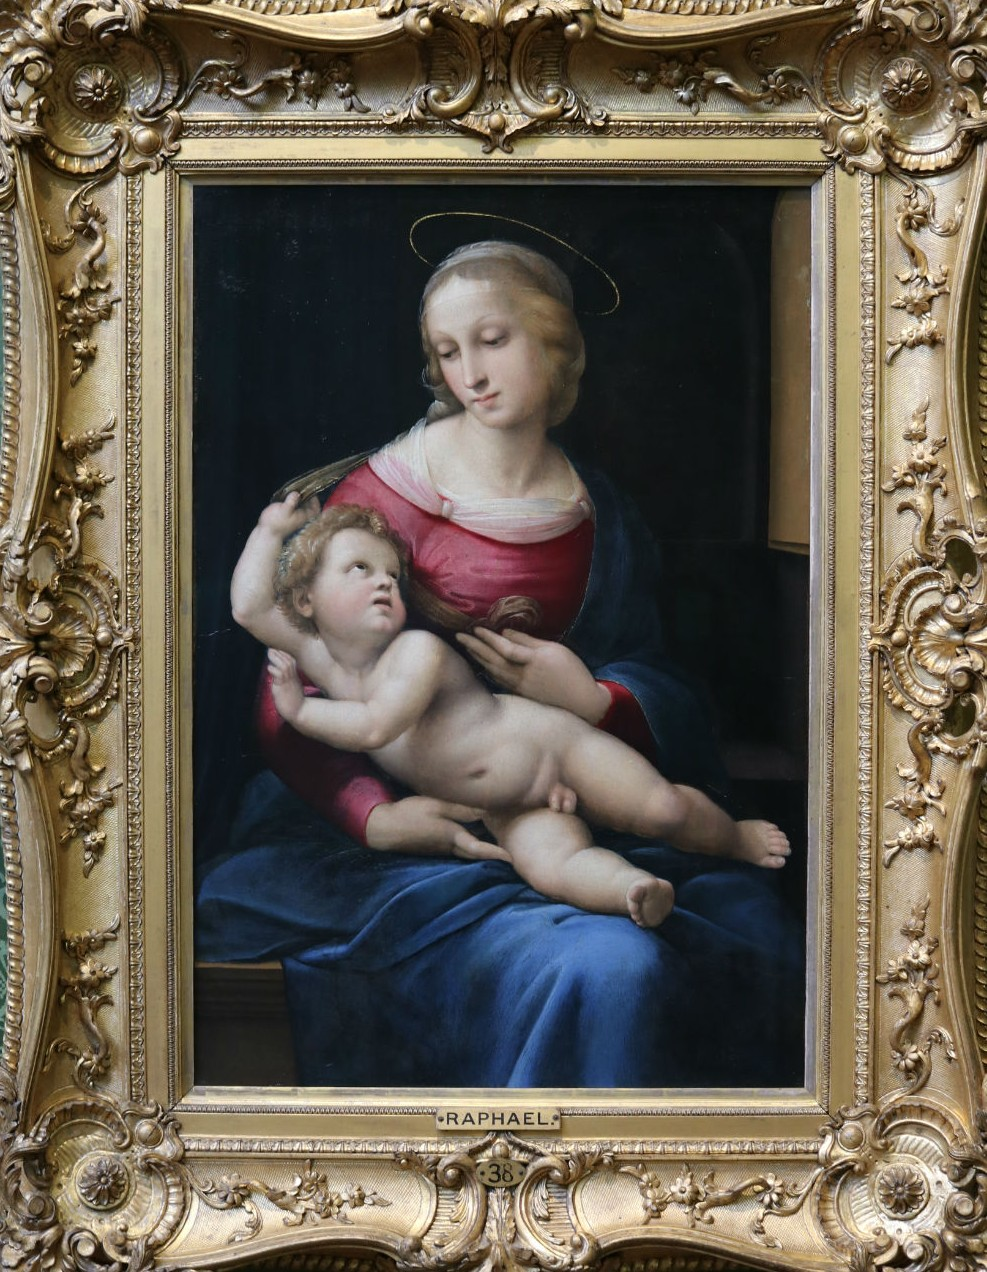 Raphael (Raffaello Sanzio), The Bridgewater Madonna, About 1508   Courtesy Of Tori Chalmers